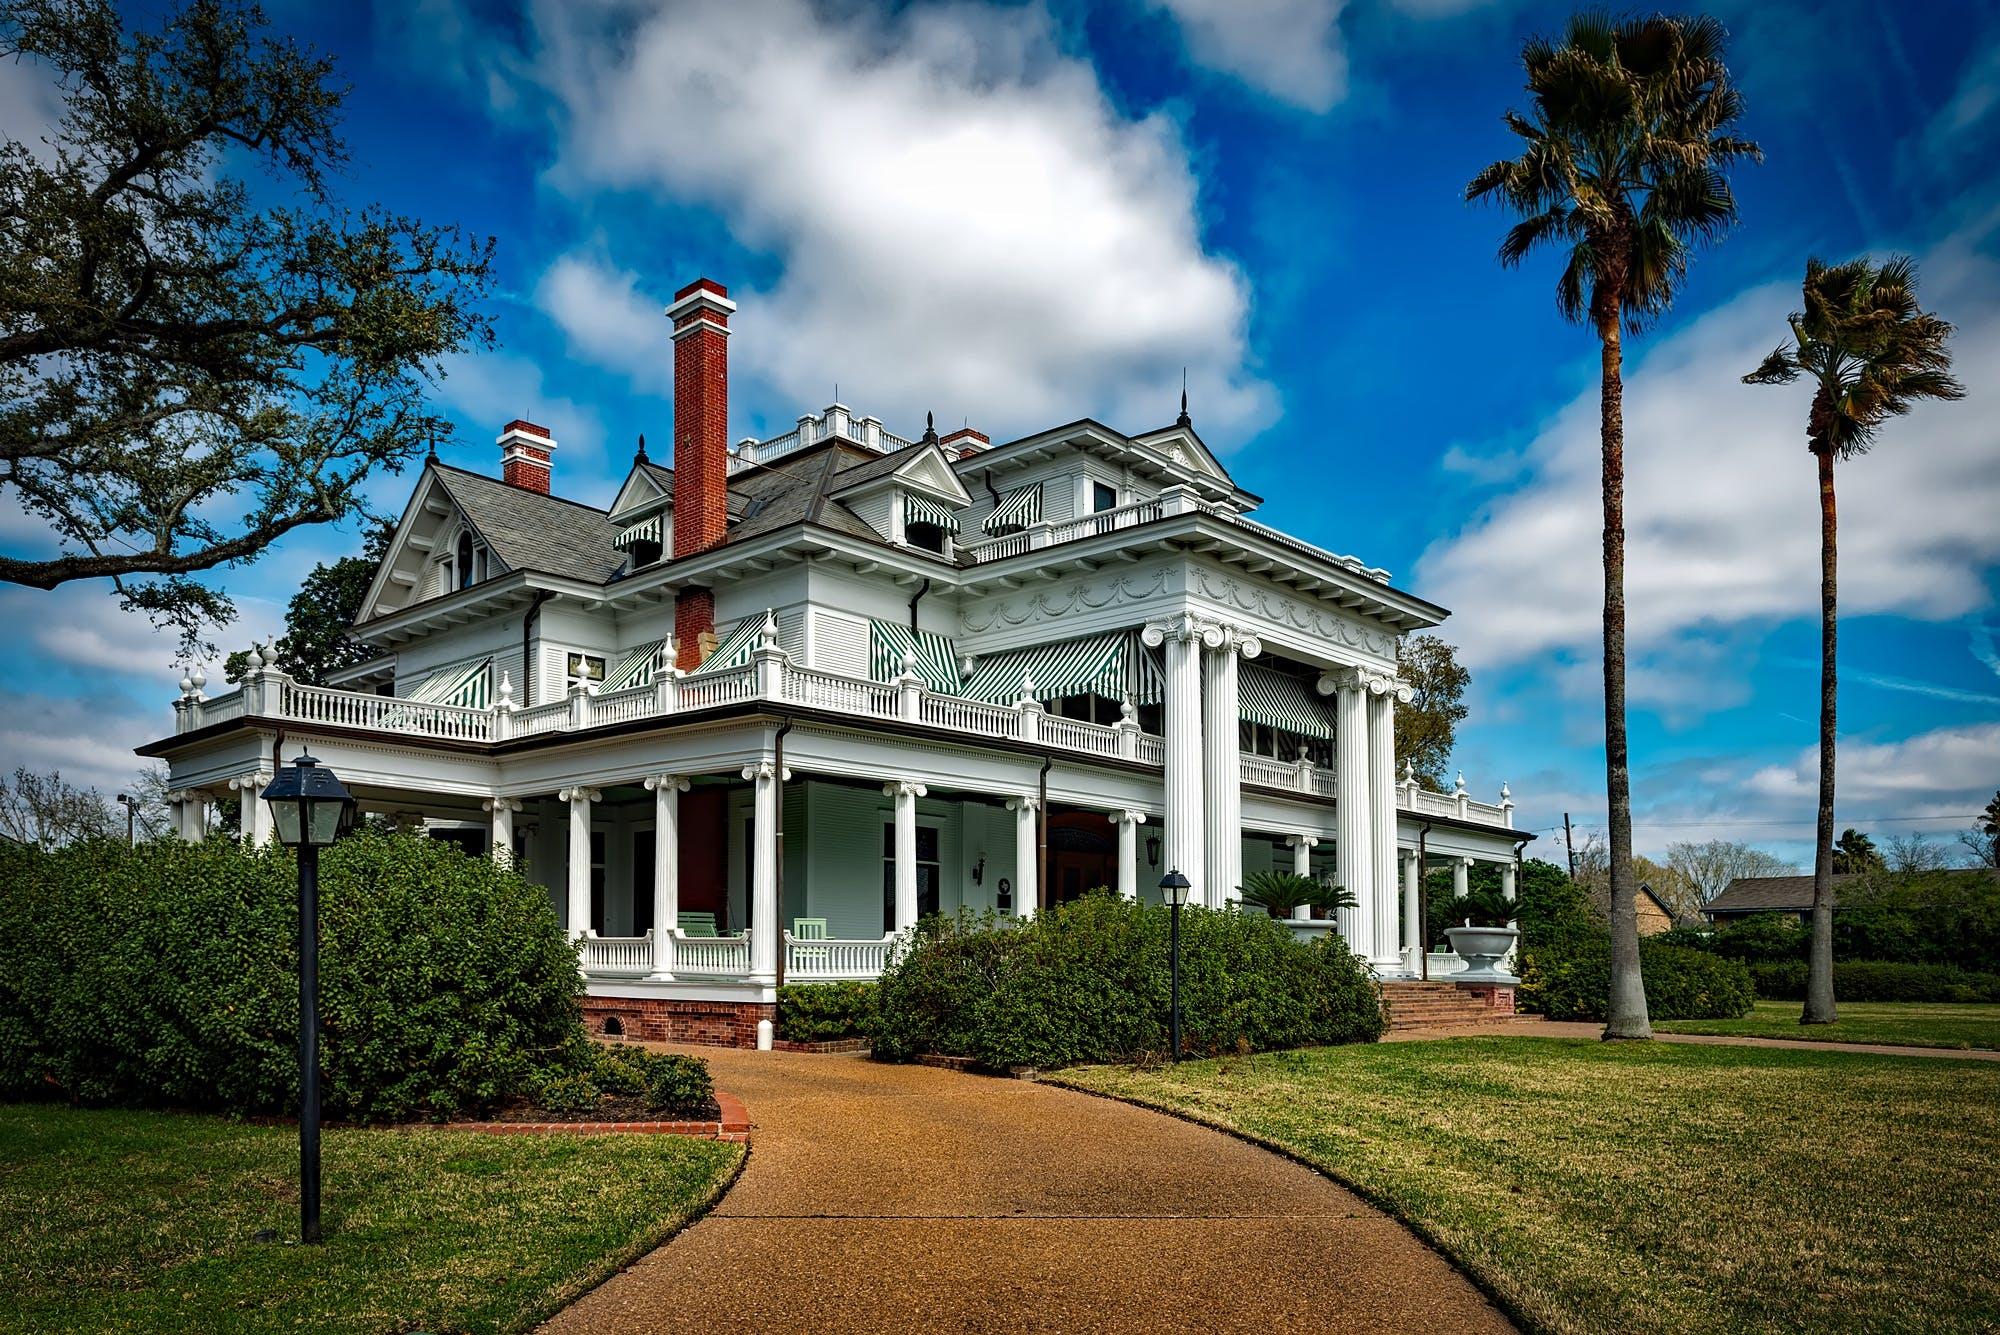 architecture, bushes, chimneys